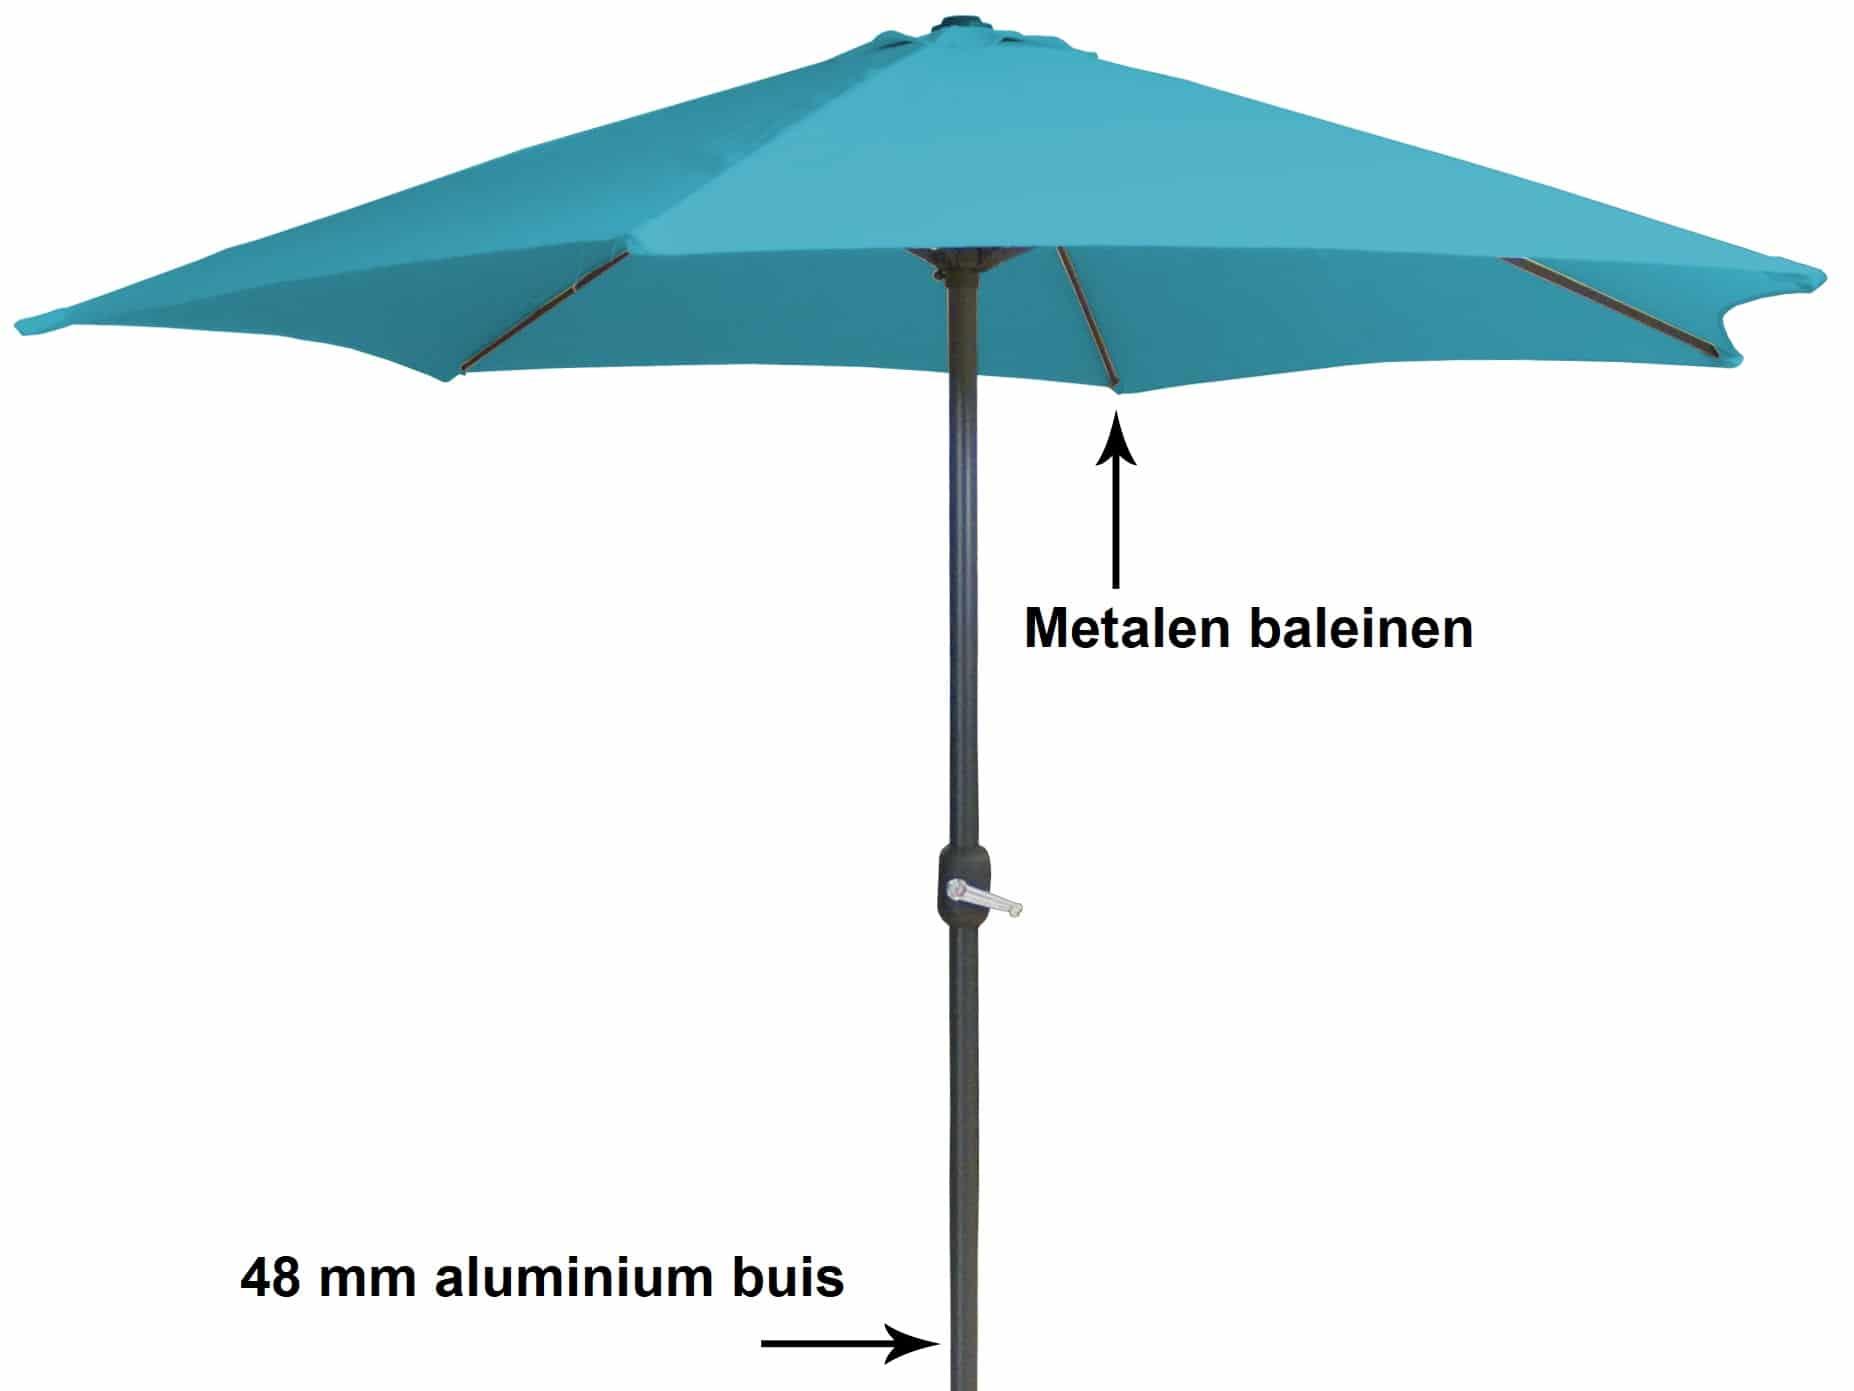 4Goodz Aluminium parasol 300 cm met opdraaimechanisme - Blauw